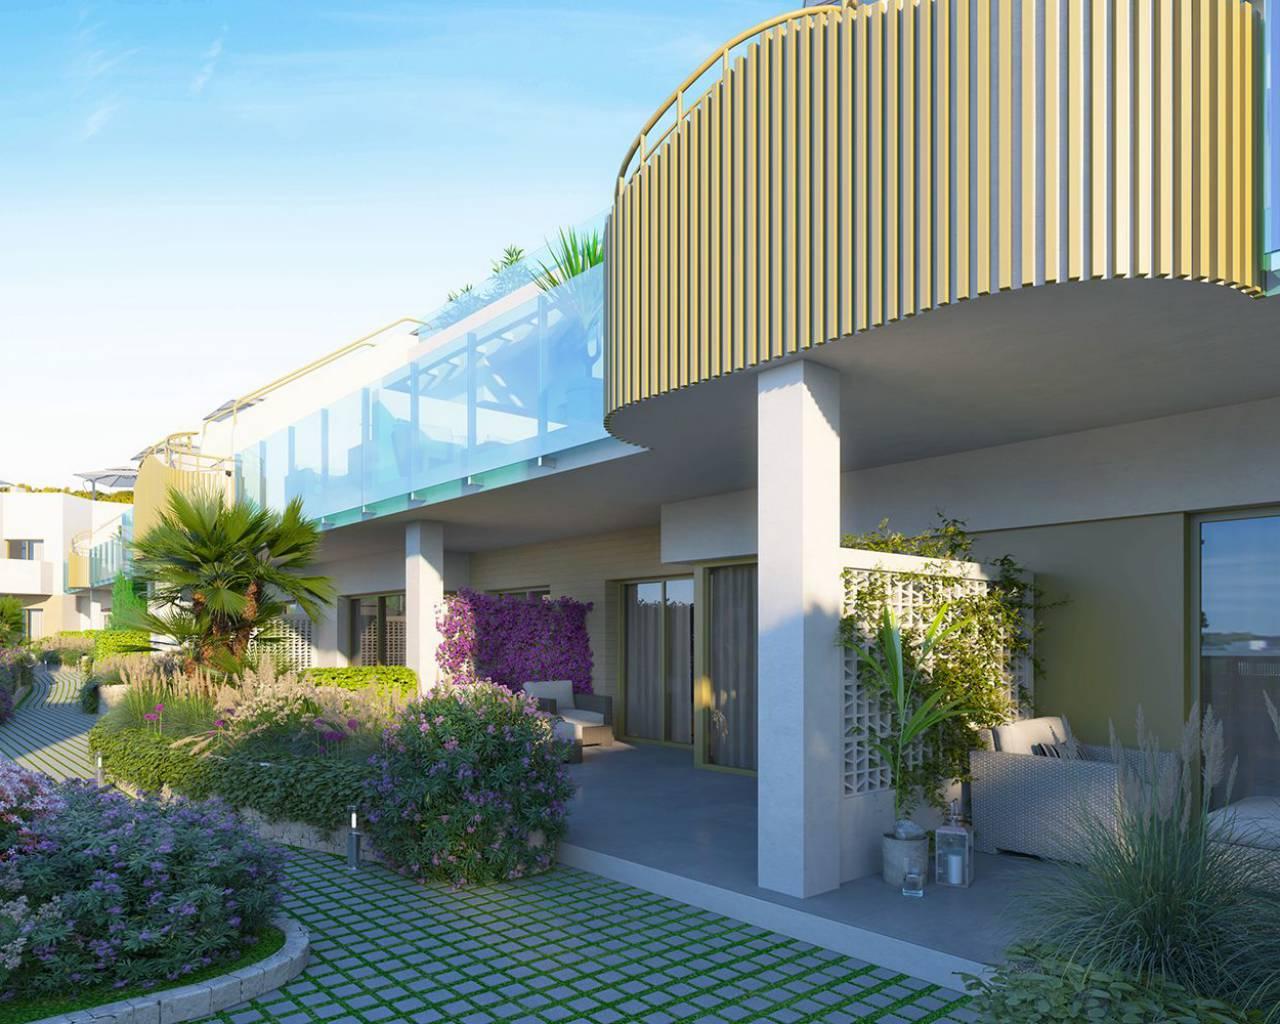 nieuwbouw-appartement-pilar-de-la-horadada_5787_xl